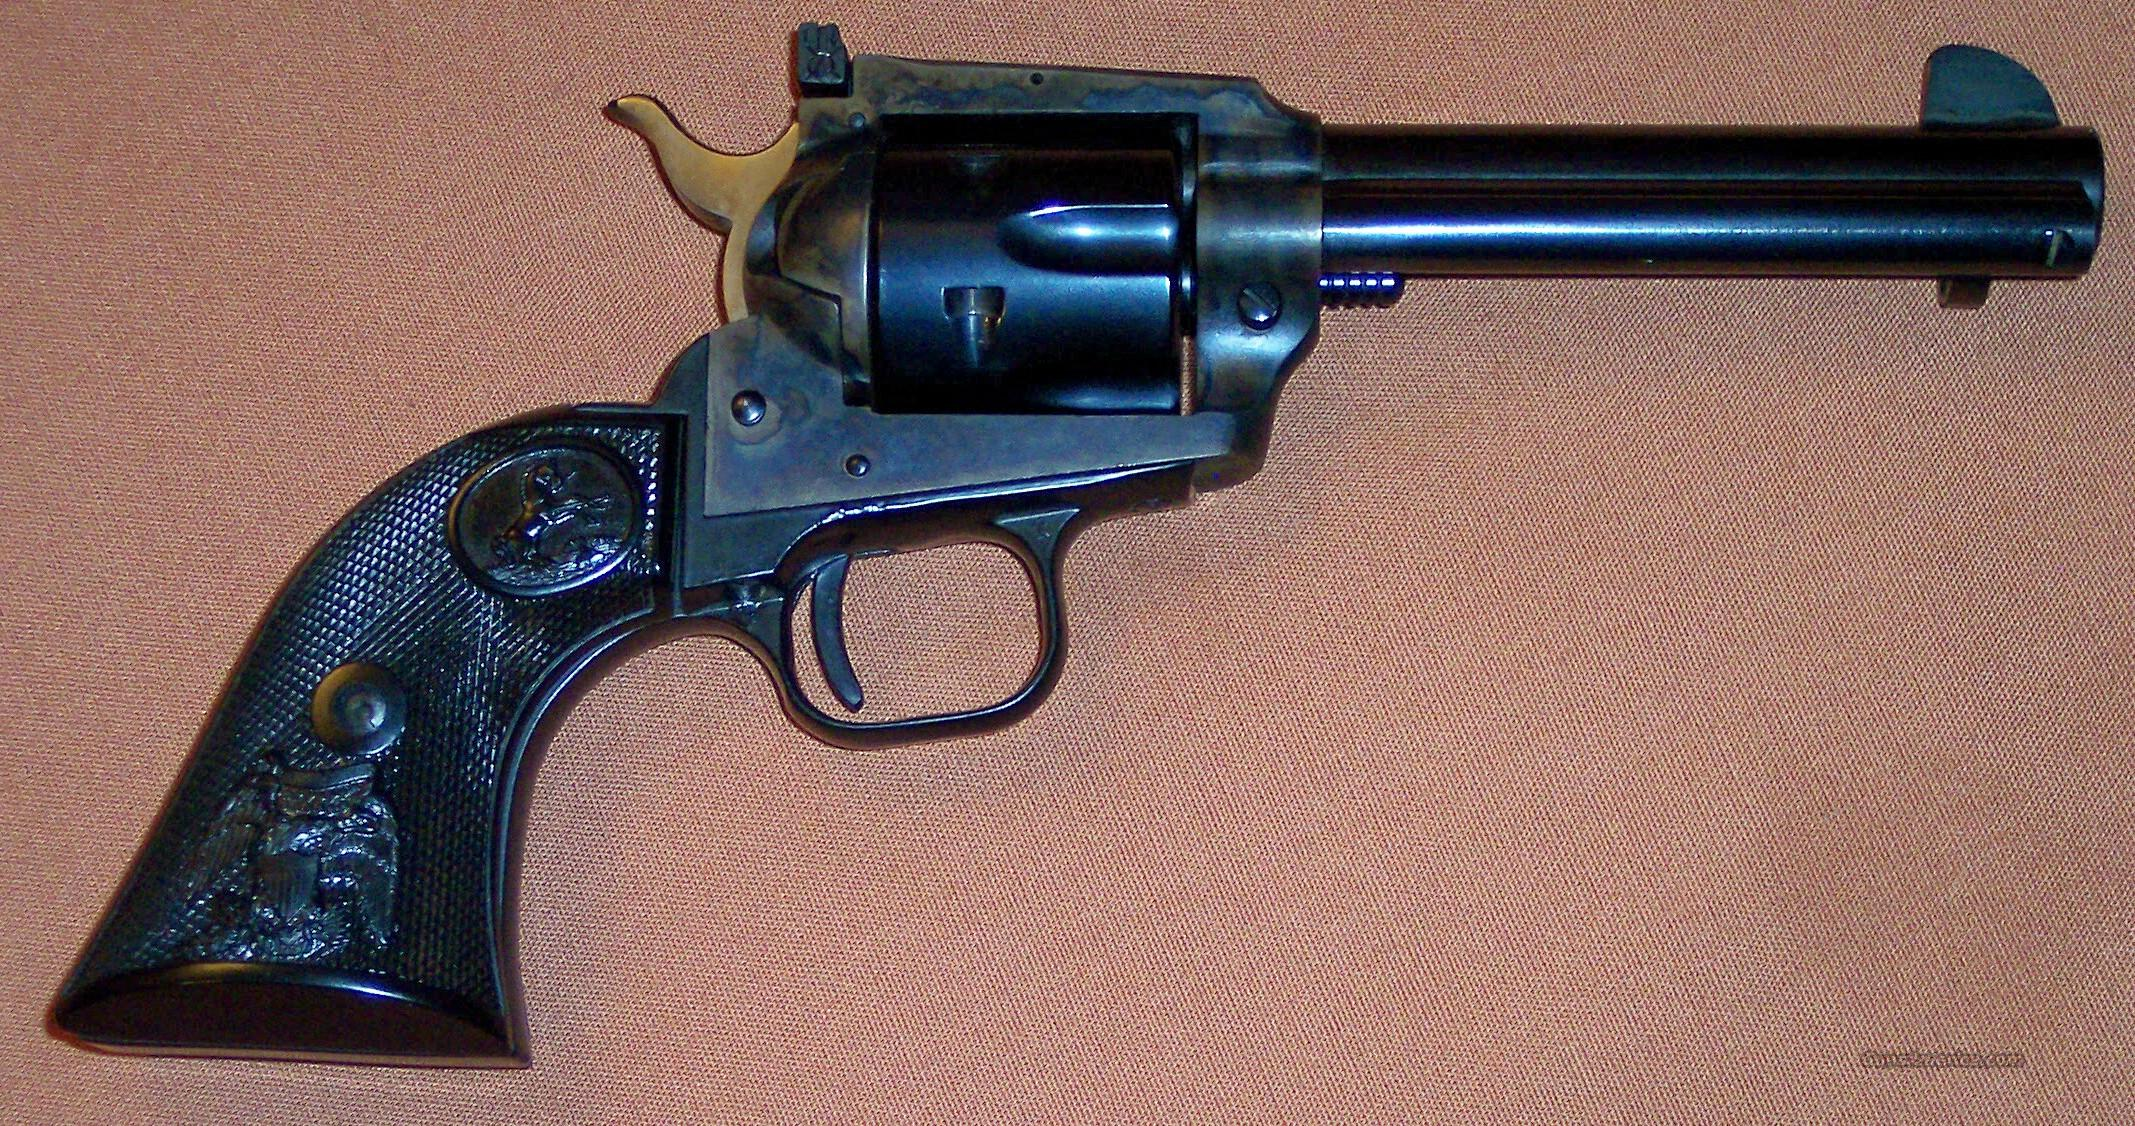 High Resolution Wallpaper | Colt New Frontier Revolver 2135x1126 px